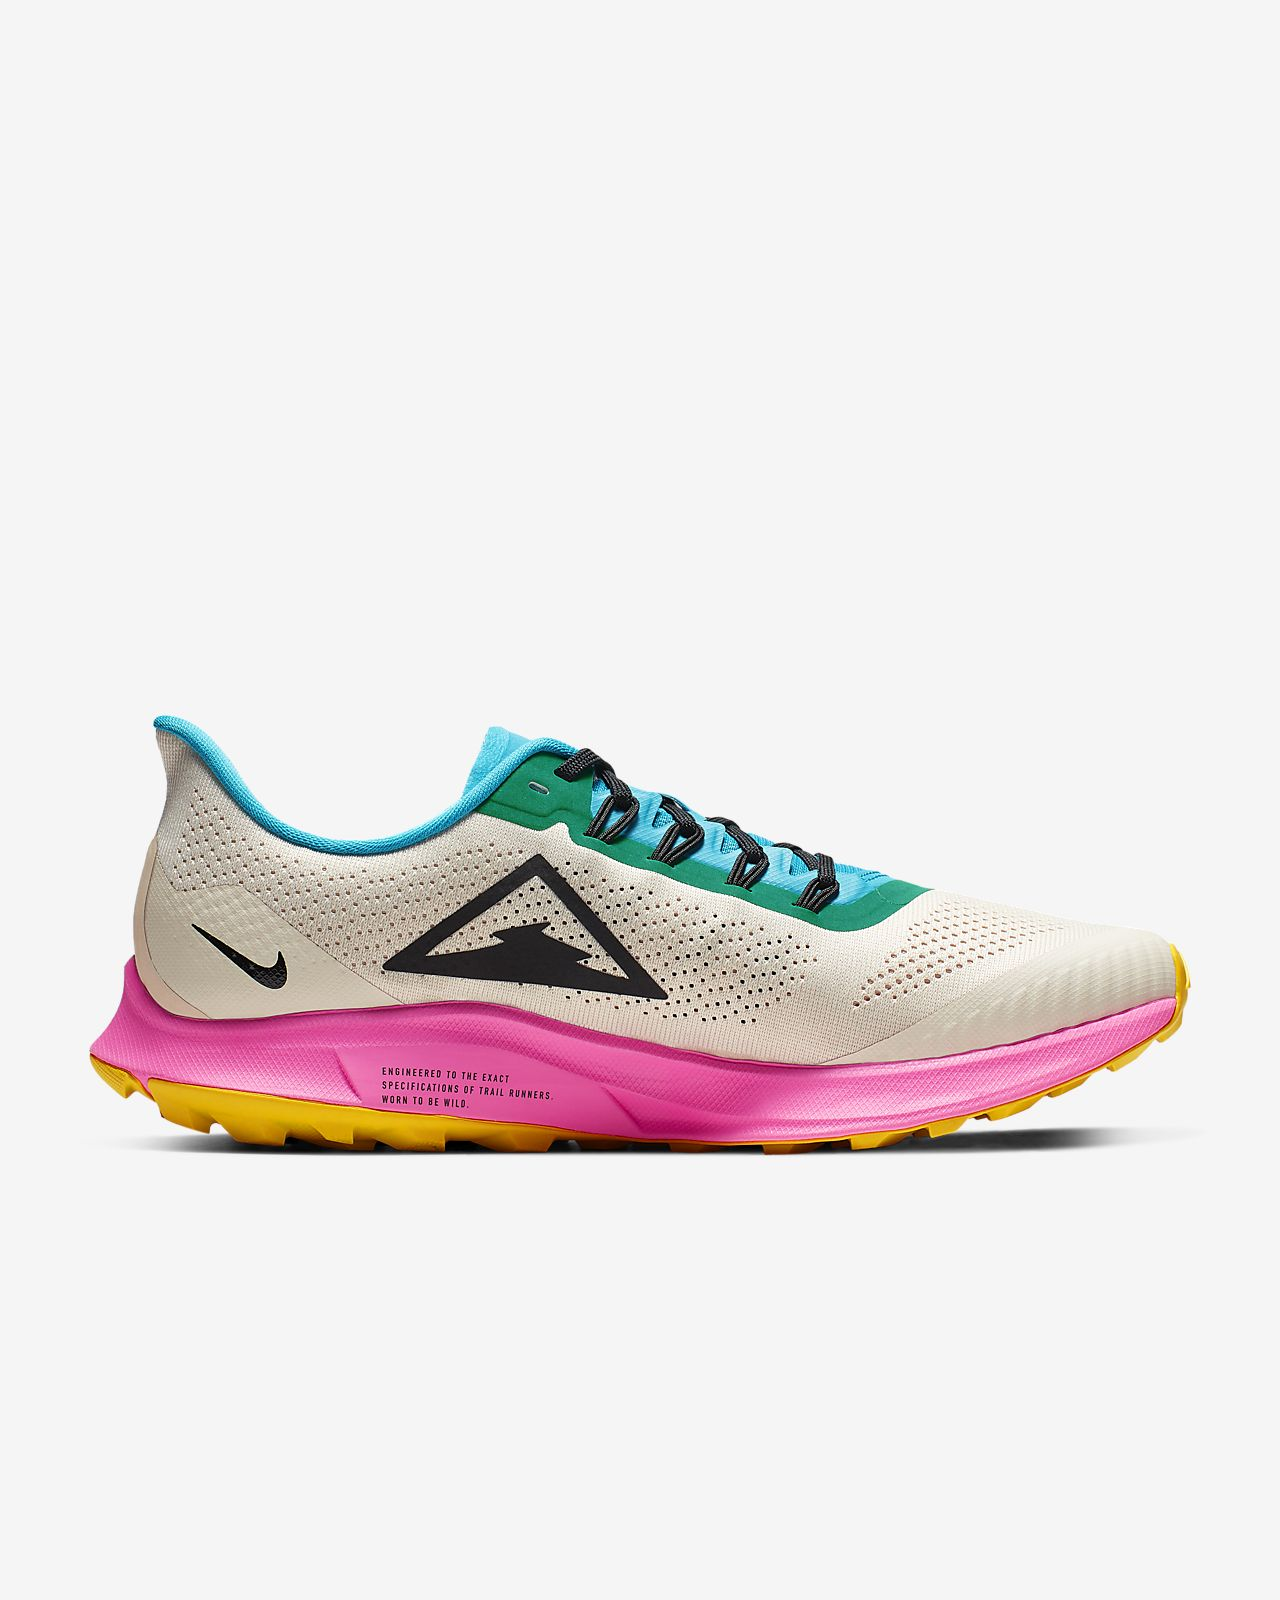 meilleures baskets 38211 678f8 Nike Air Zoom Pegasus 36 Trail Men's Running Shoe